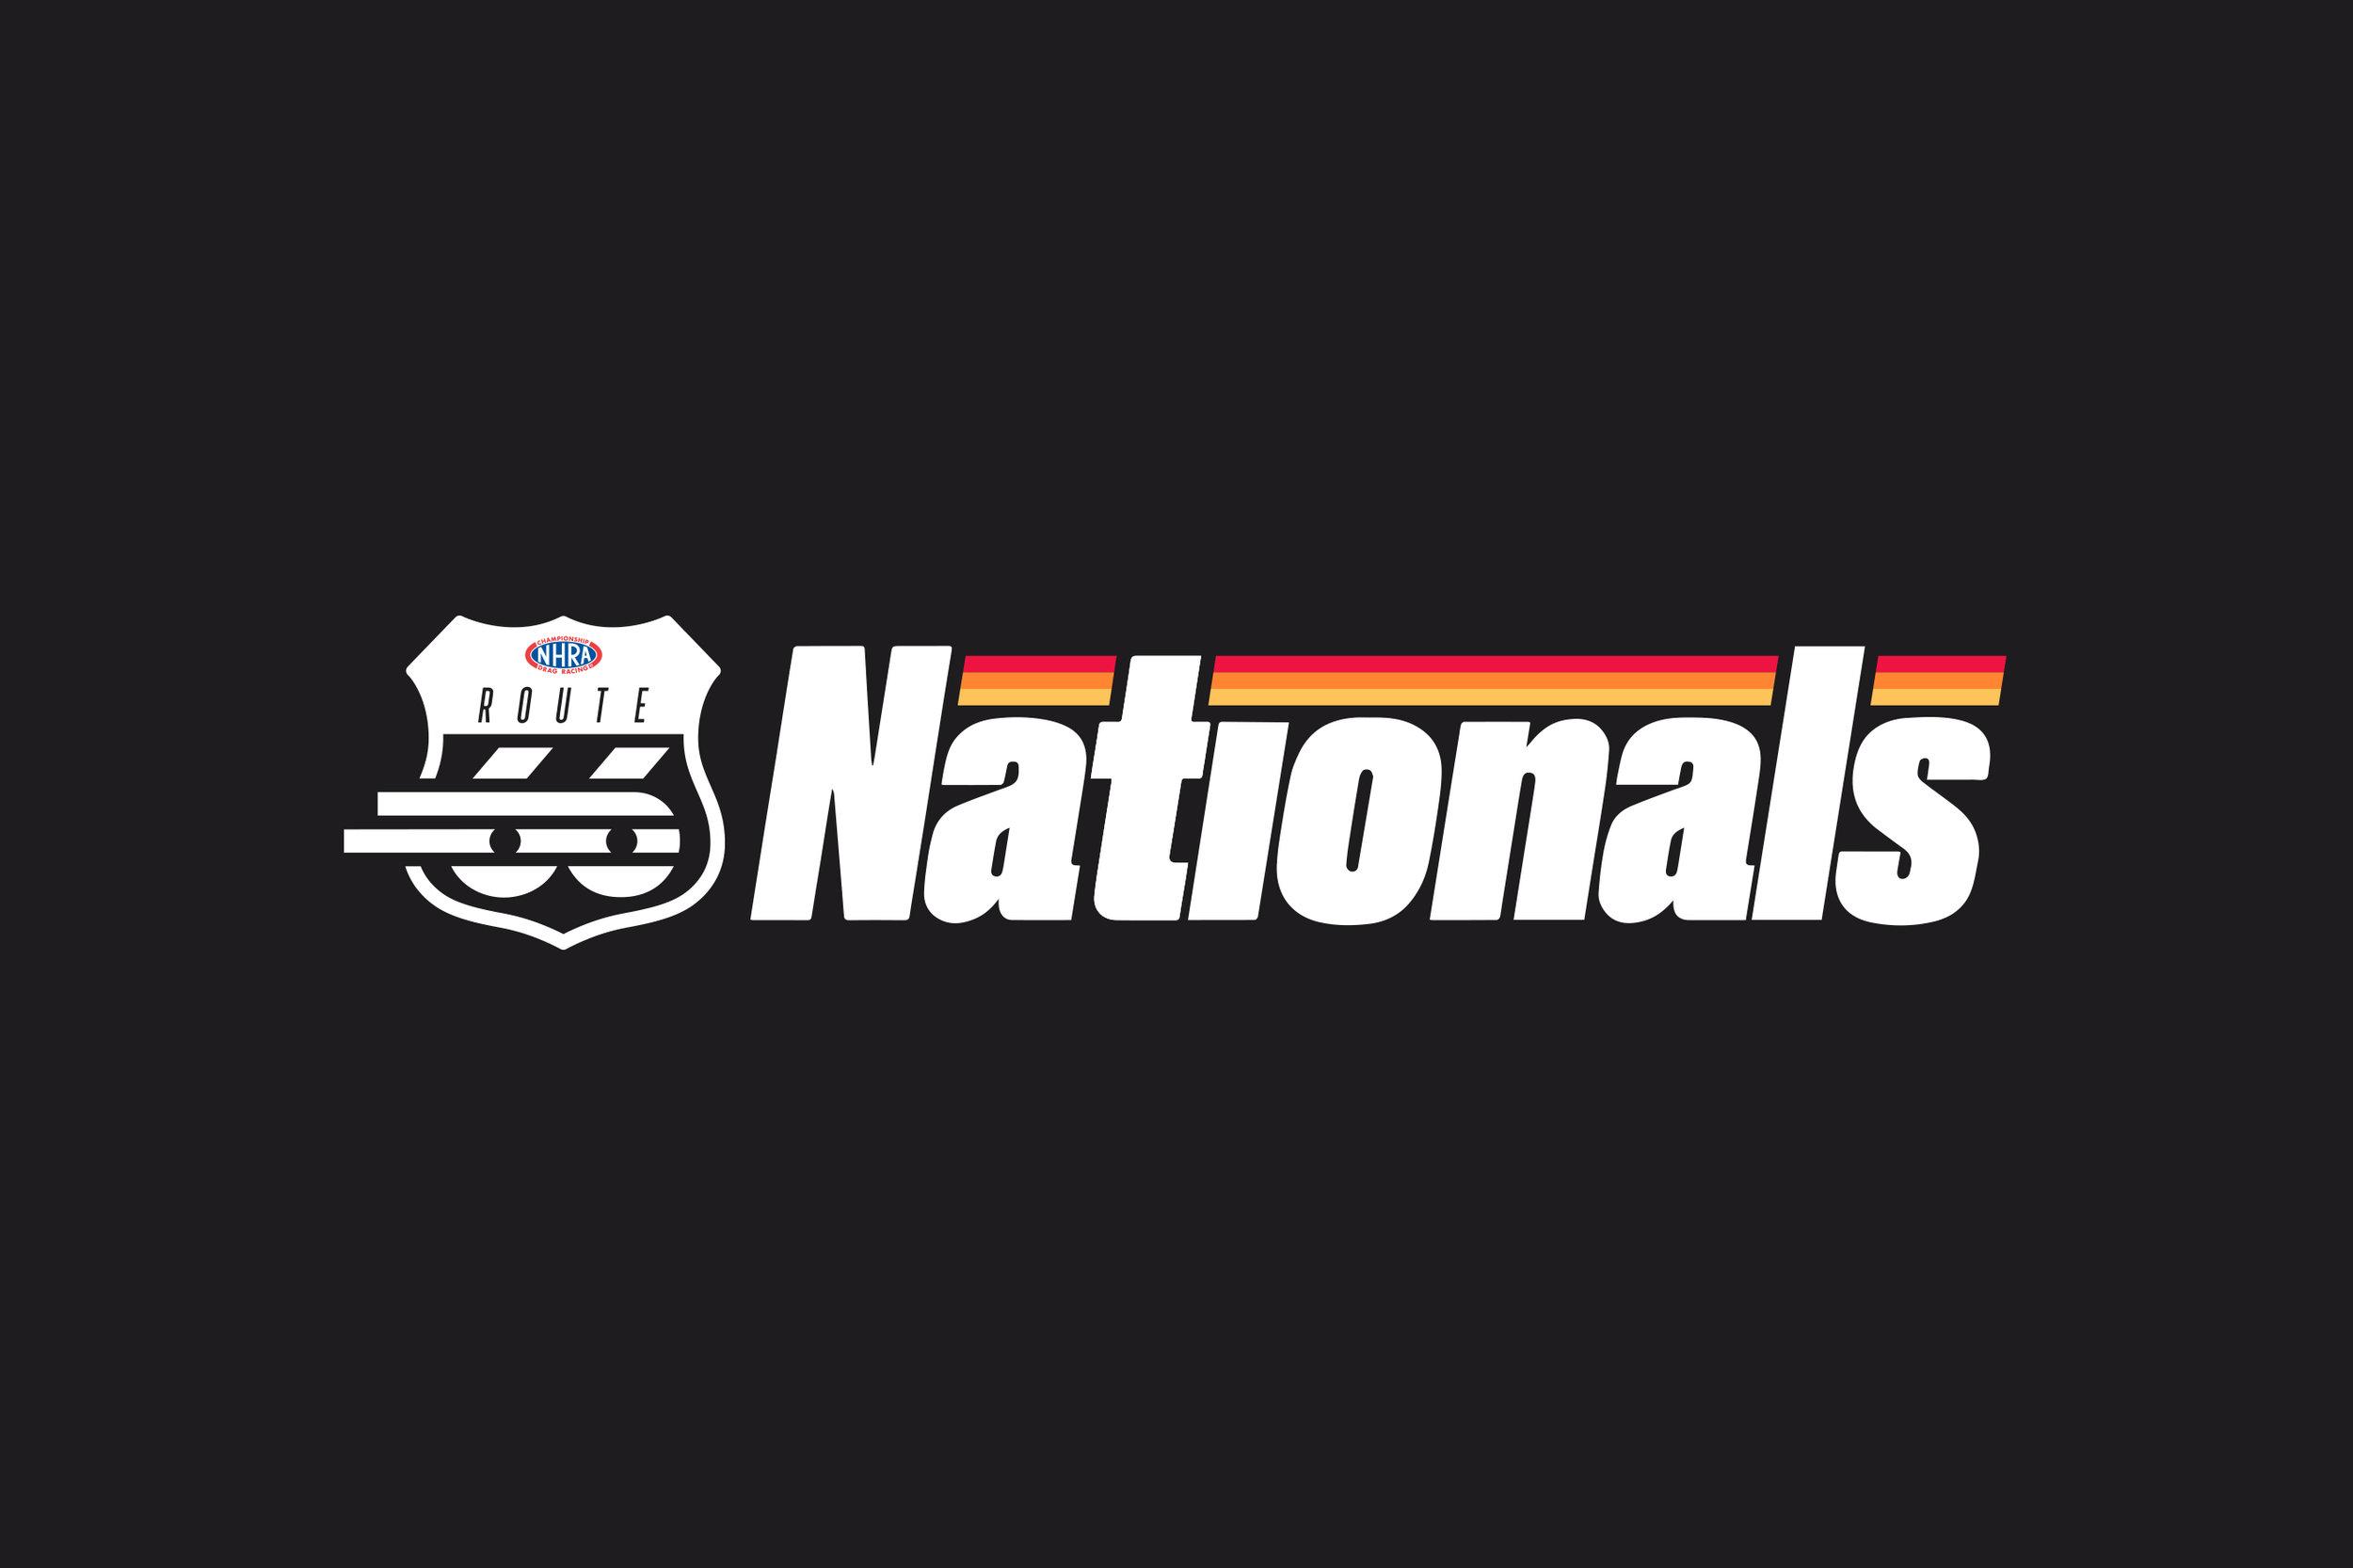 Route 66 Raceway Nationals Series  logo / Design